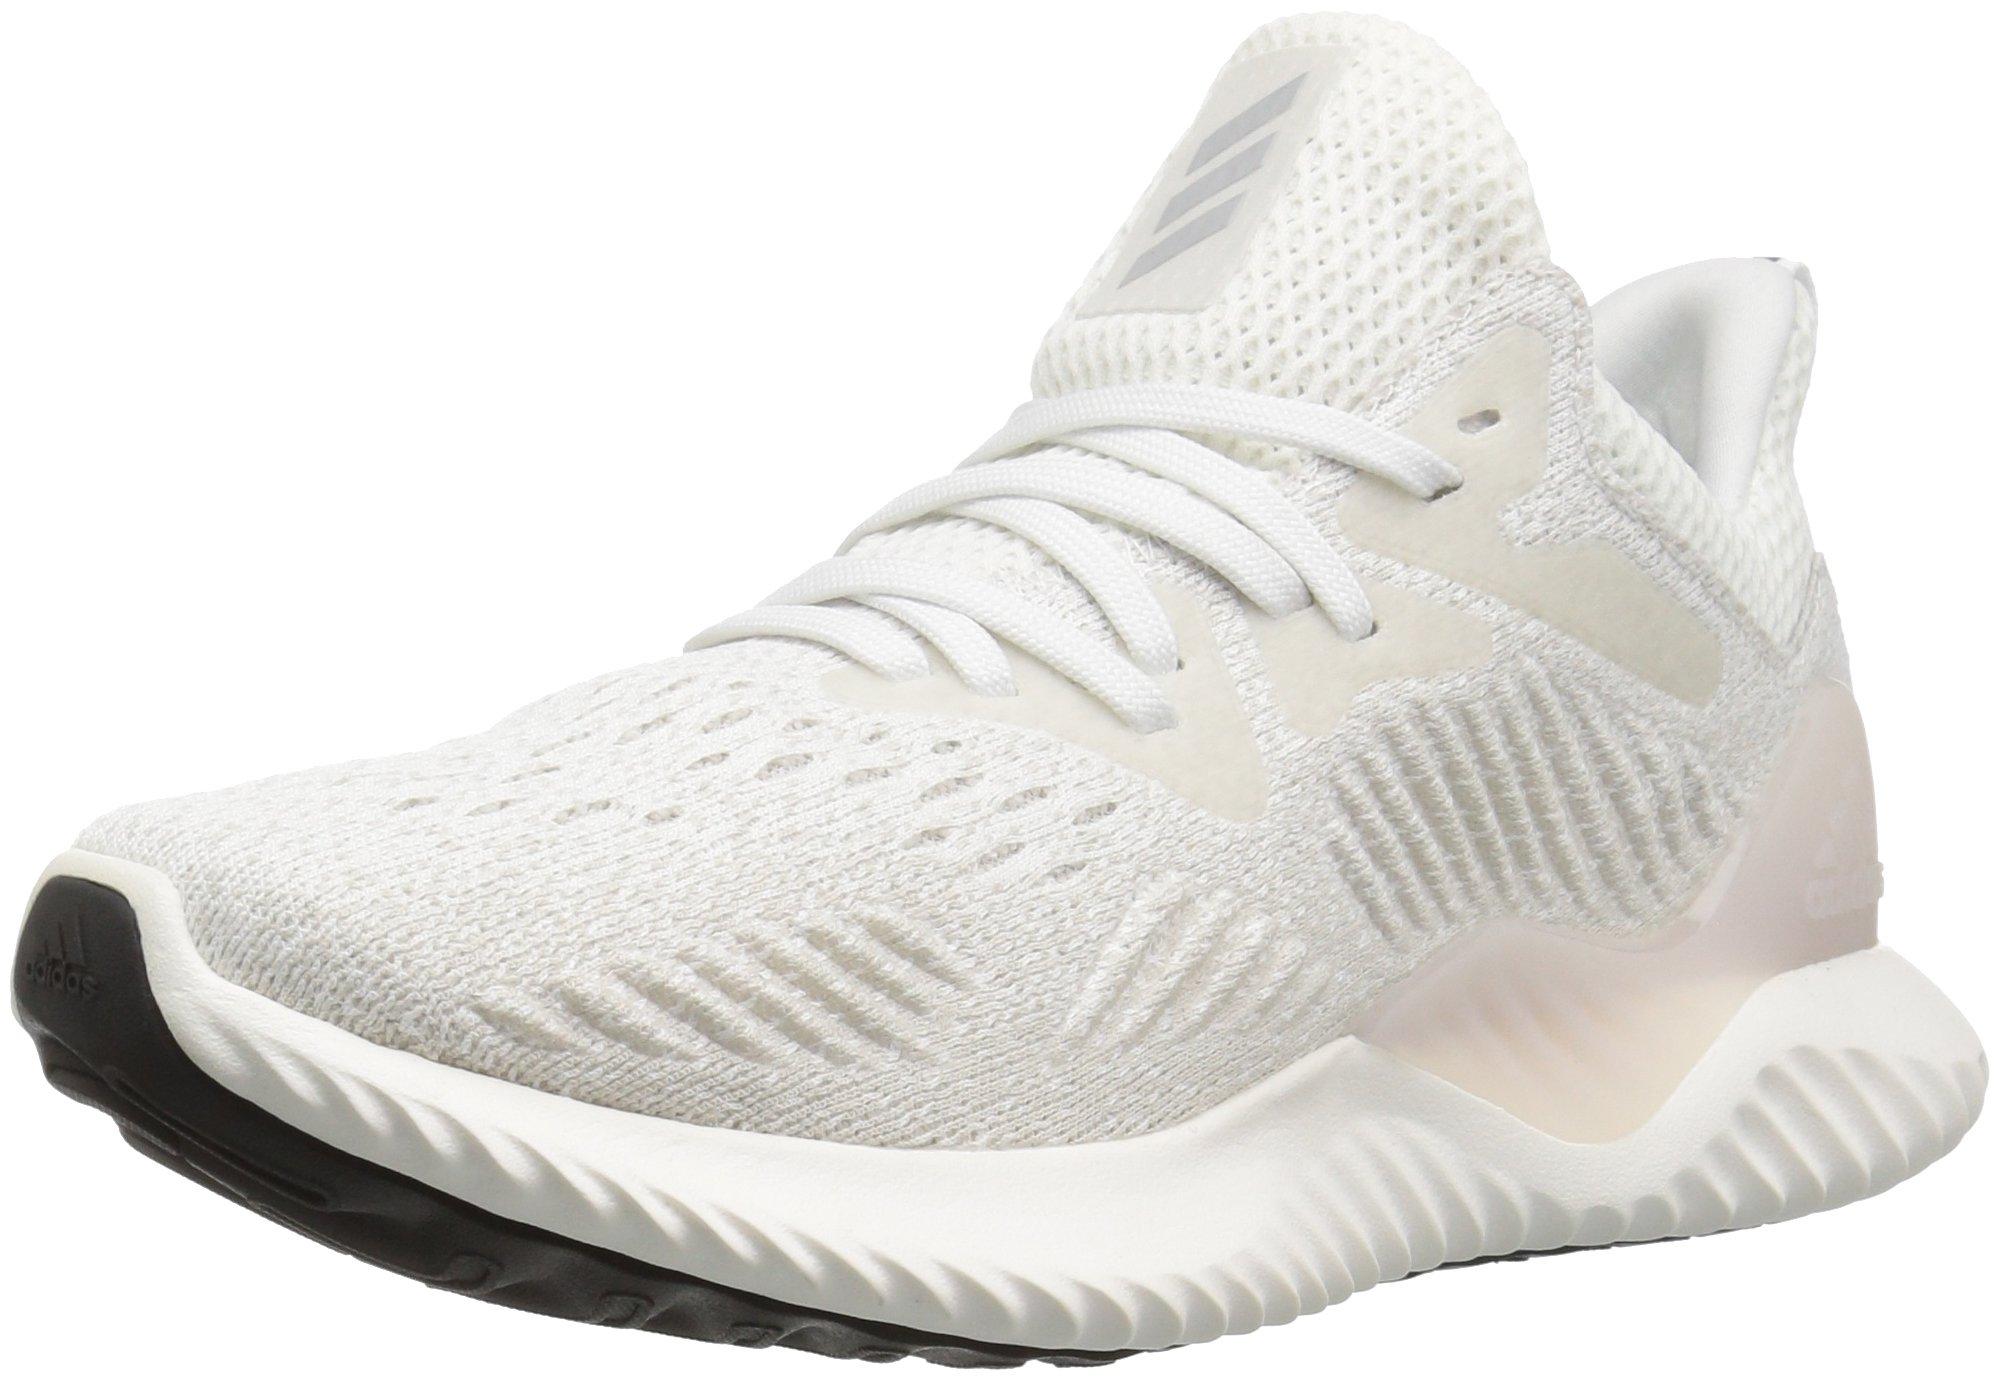 adidas Women's Alphabounce Beyond Running Shoe, White/Grey/Grey, 8 M US